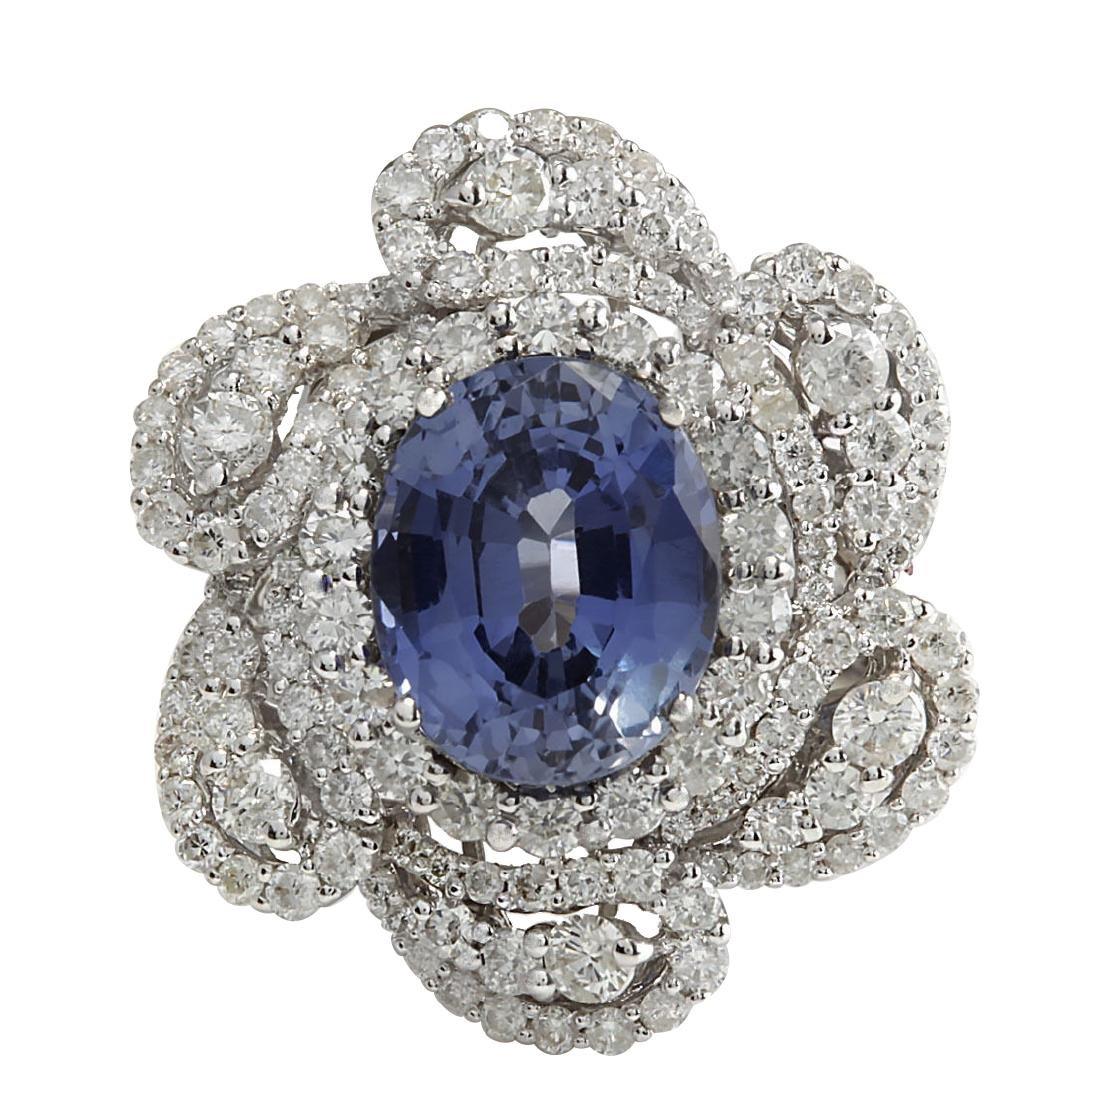 6.96CTW Natural Blue Ceylon Sapphire Diamond Ring 18K